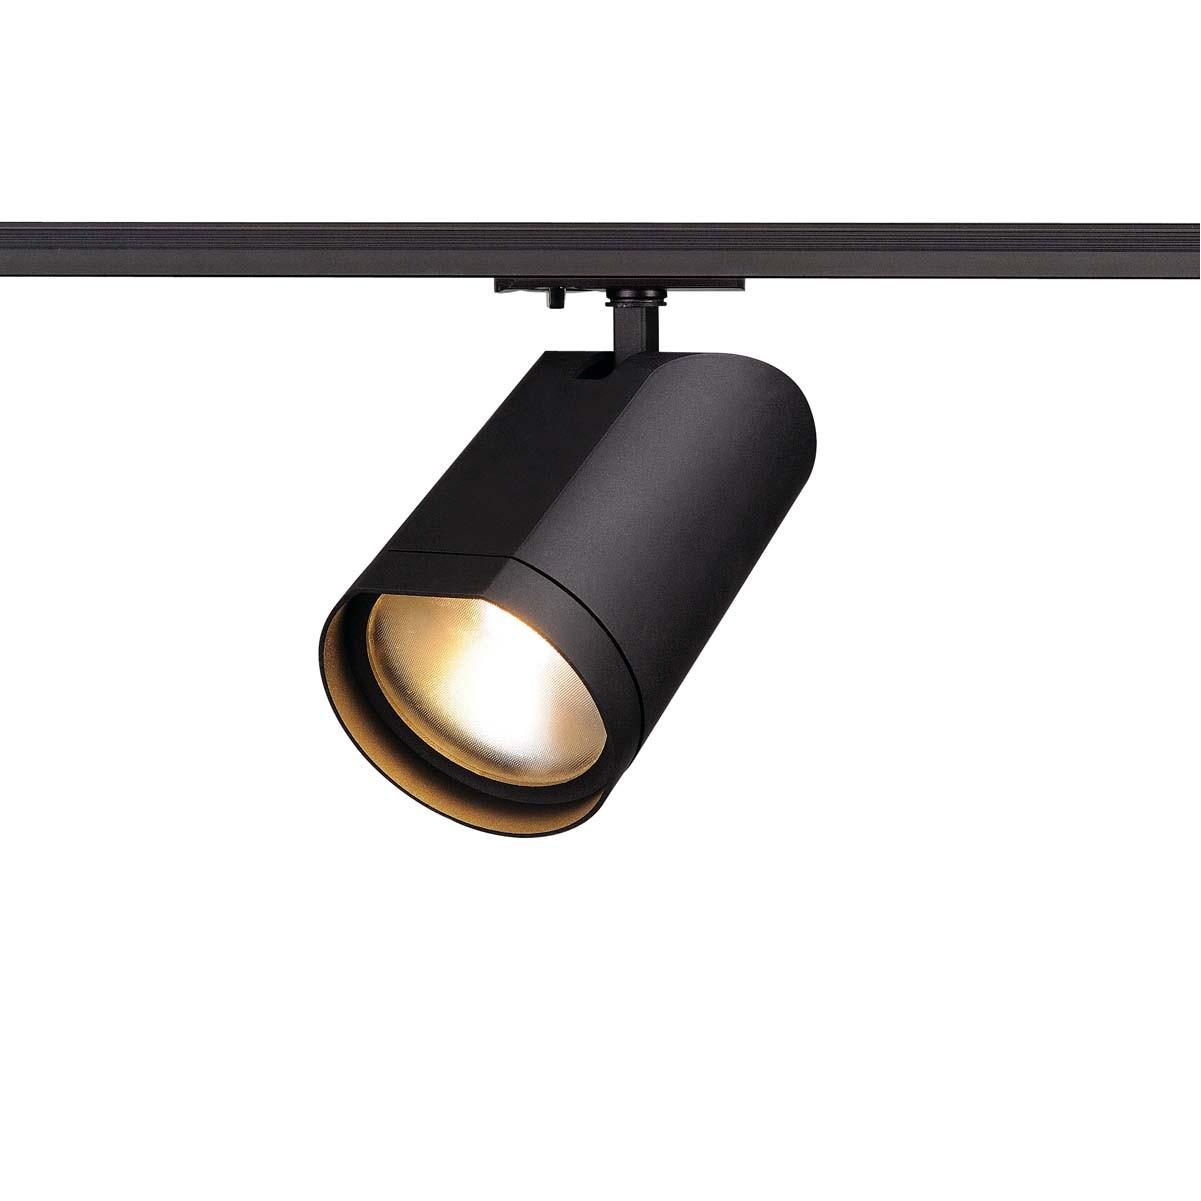 SLV 143550 Bilas LED Spot 15W 2700K 1 Circuit 240v Track Light Matt Black